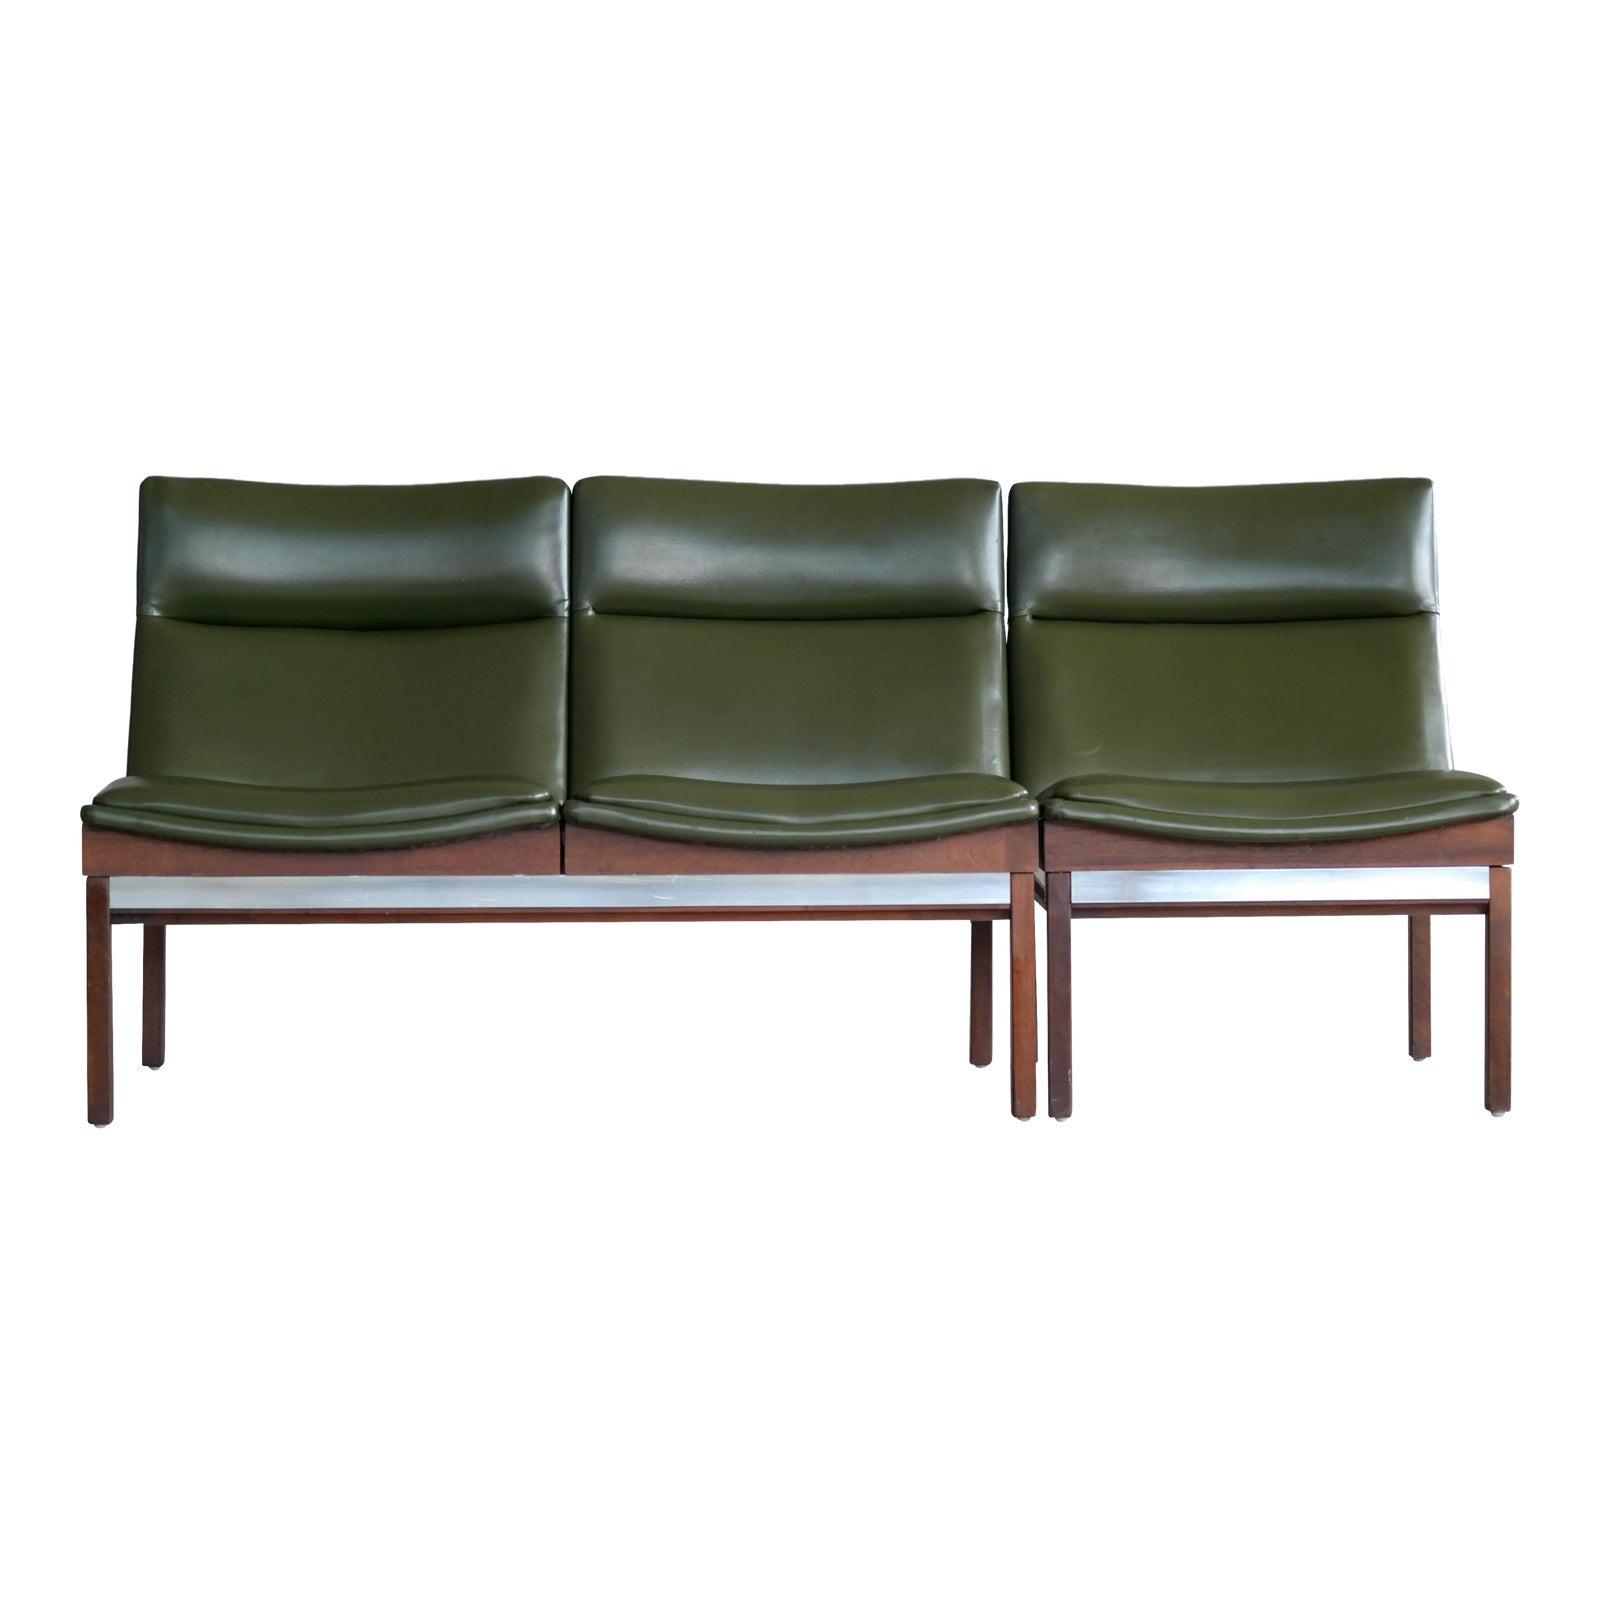 Arthur umanoff walnut modular sofa and chair set for madison furniture 1950s chairish